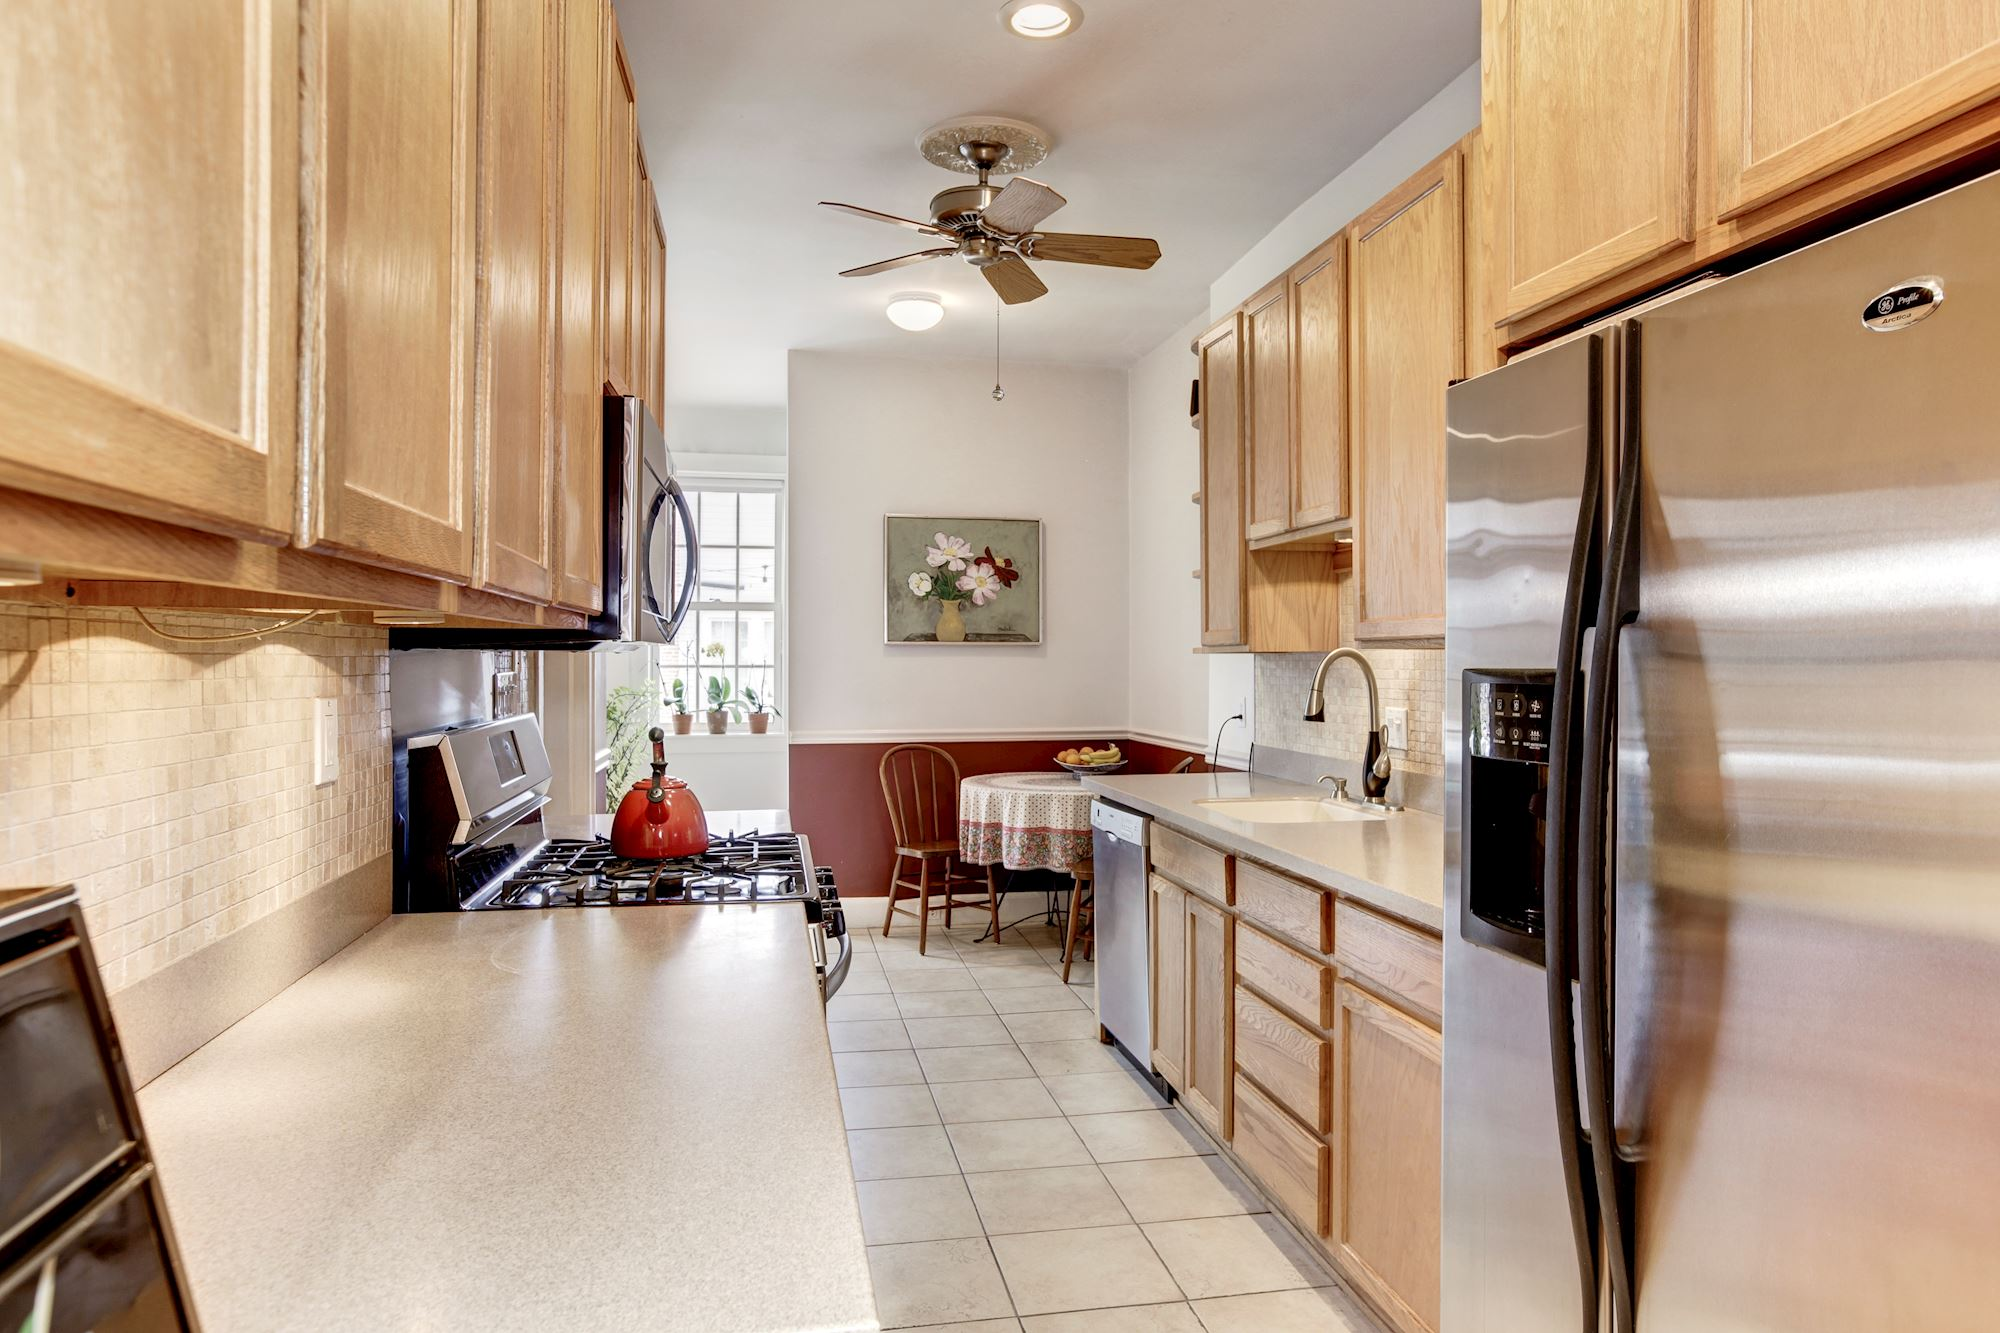 Cheerful Kitchen with Breakfast Area